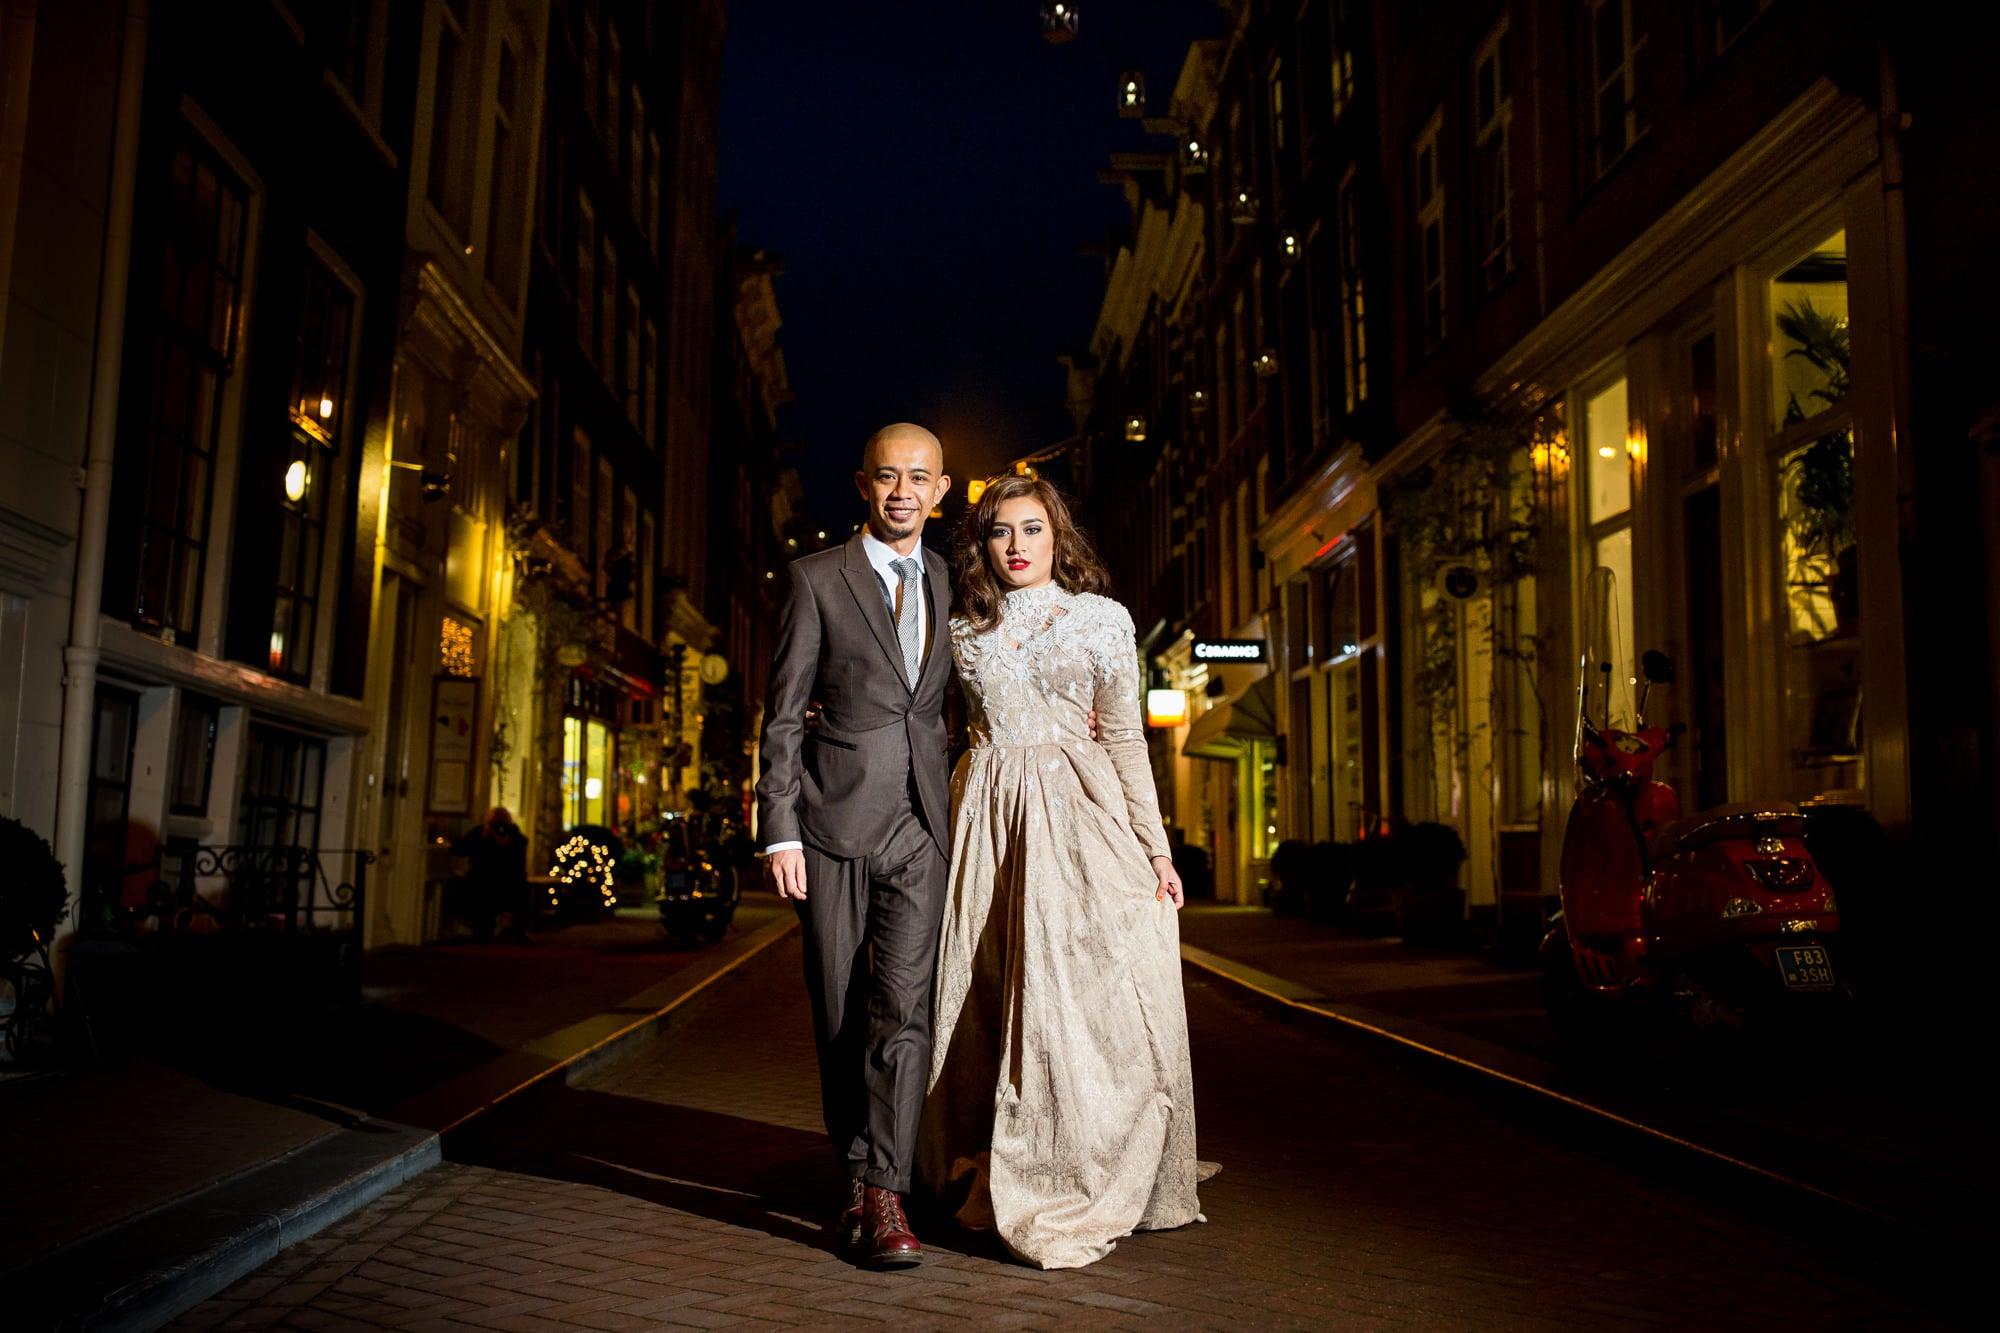 After Wedding Photoshoot Amsterdam - 05.jpg